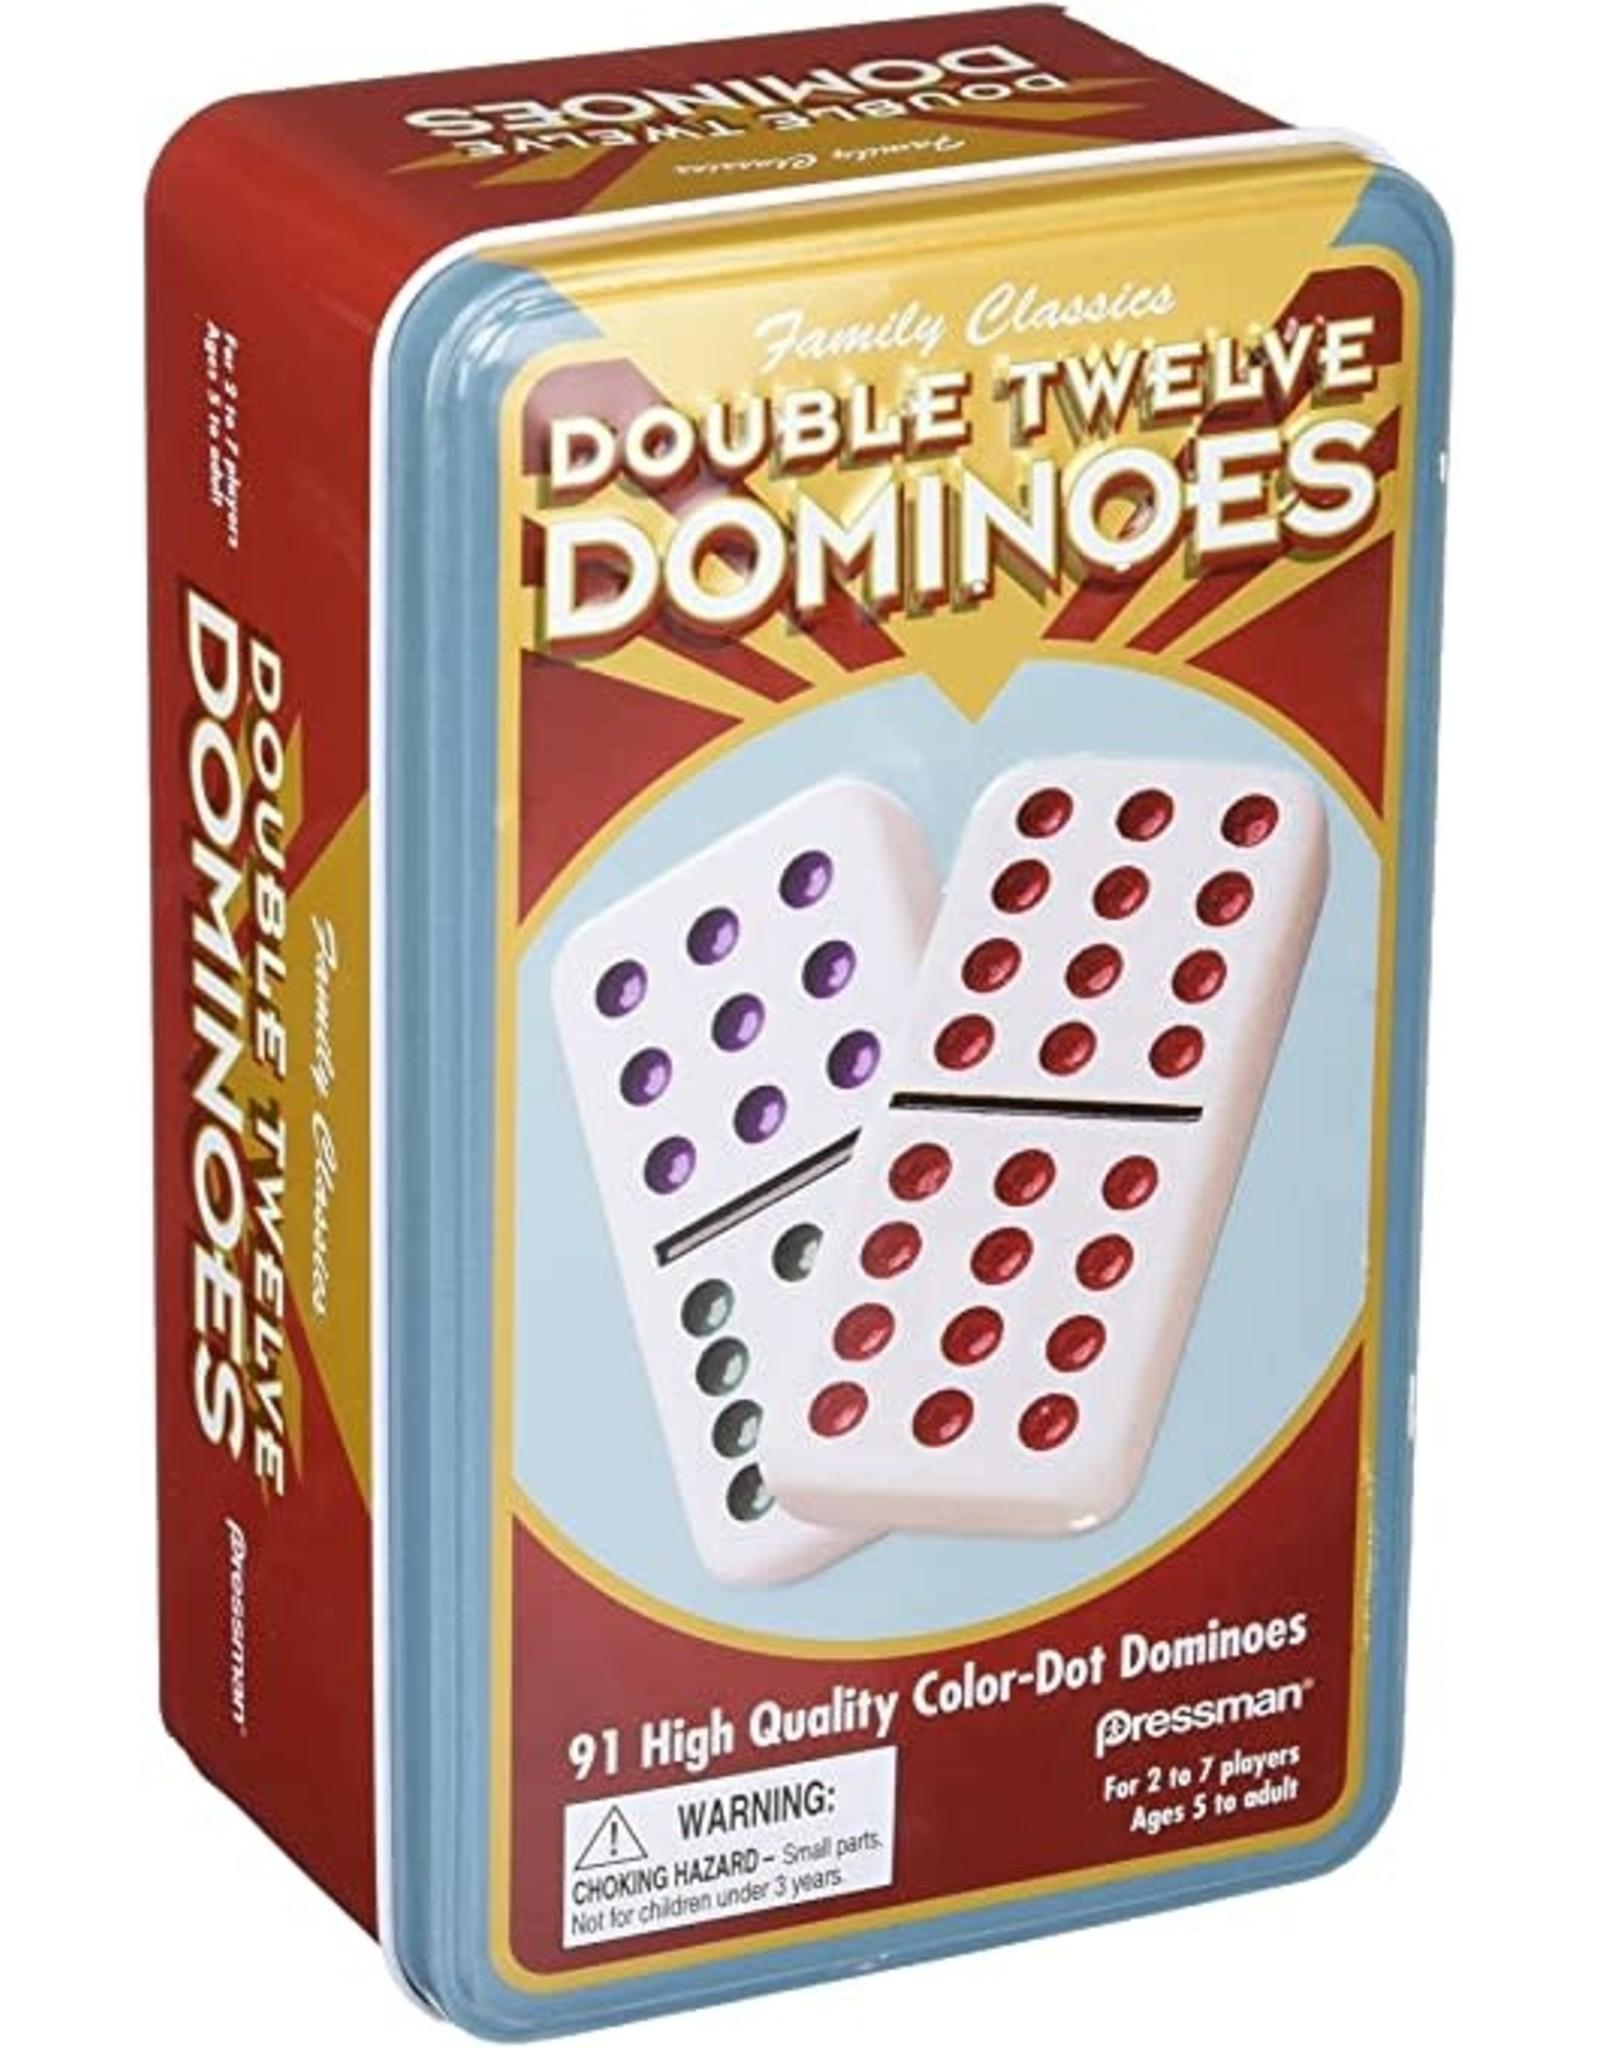 Double Twelve Dominoes Tin